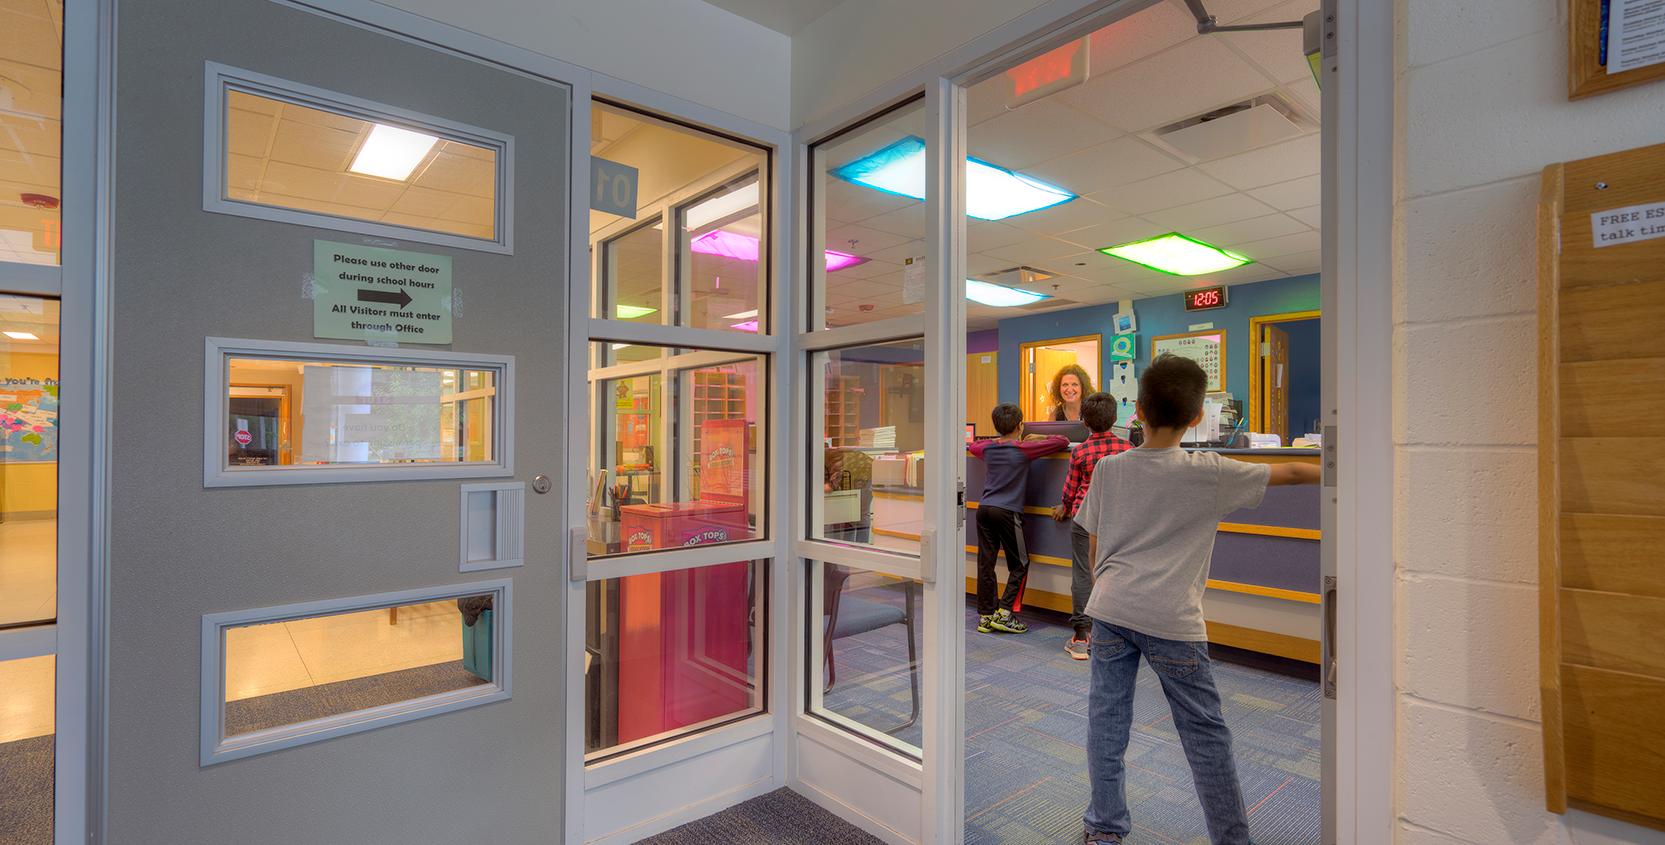 Troy-Public-Schools-School-Entrance-and-Reception_1665x845